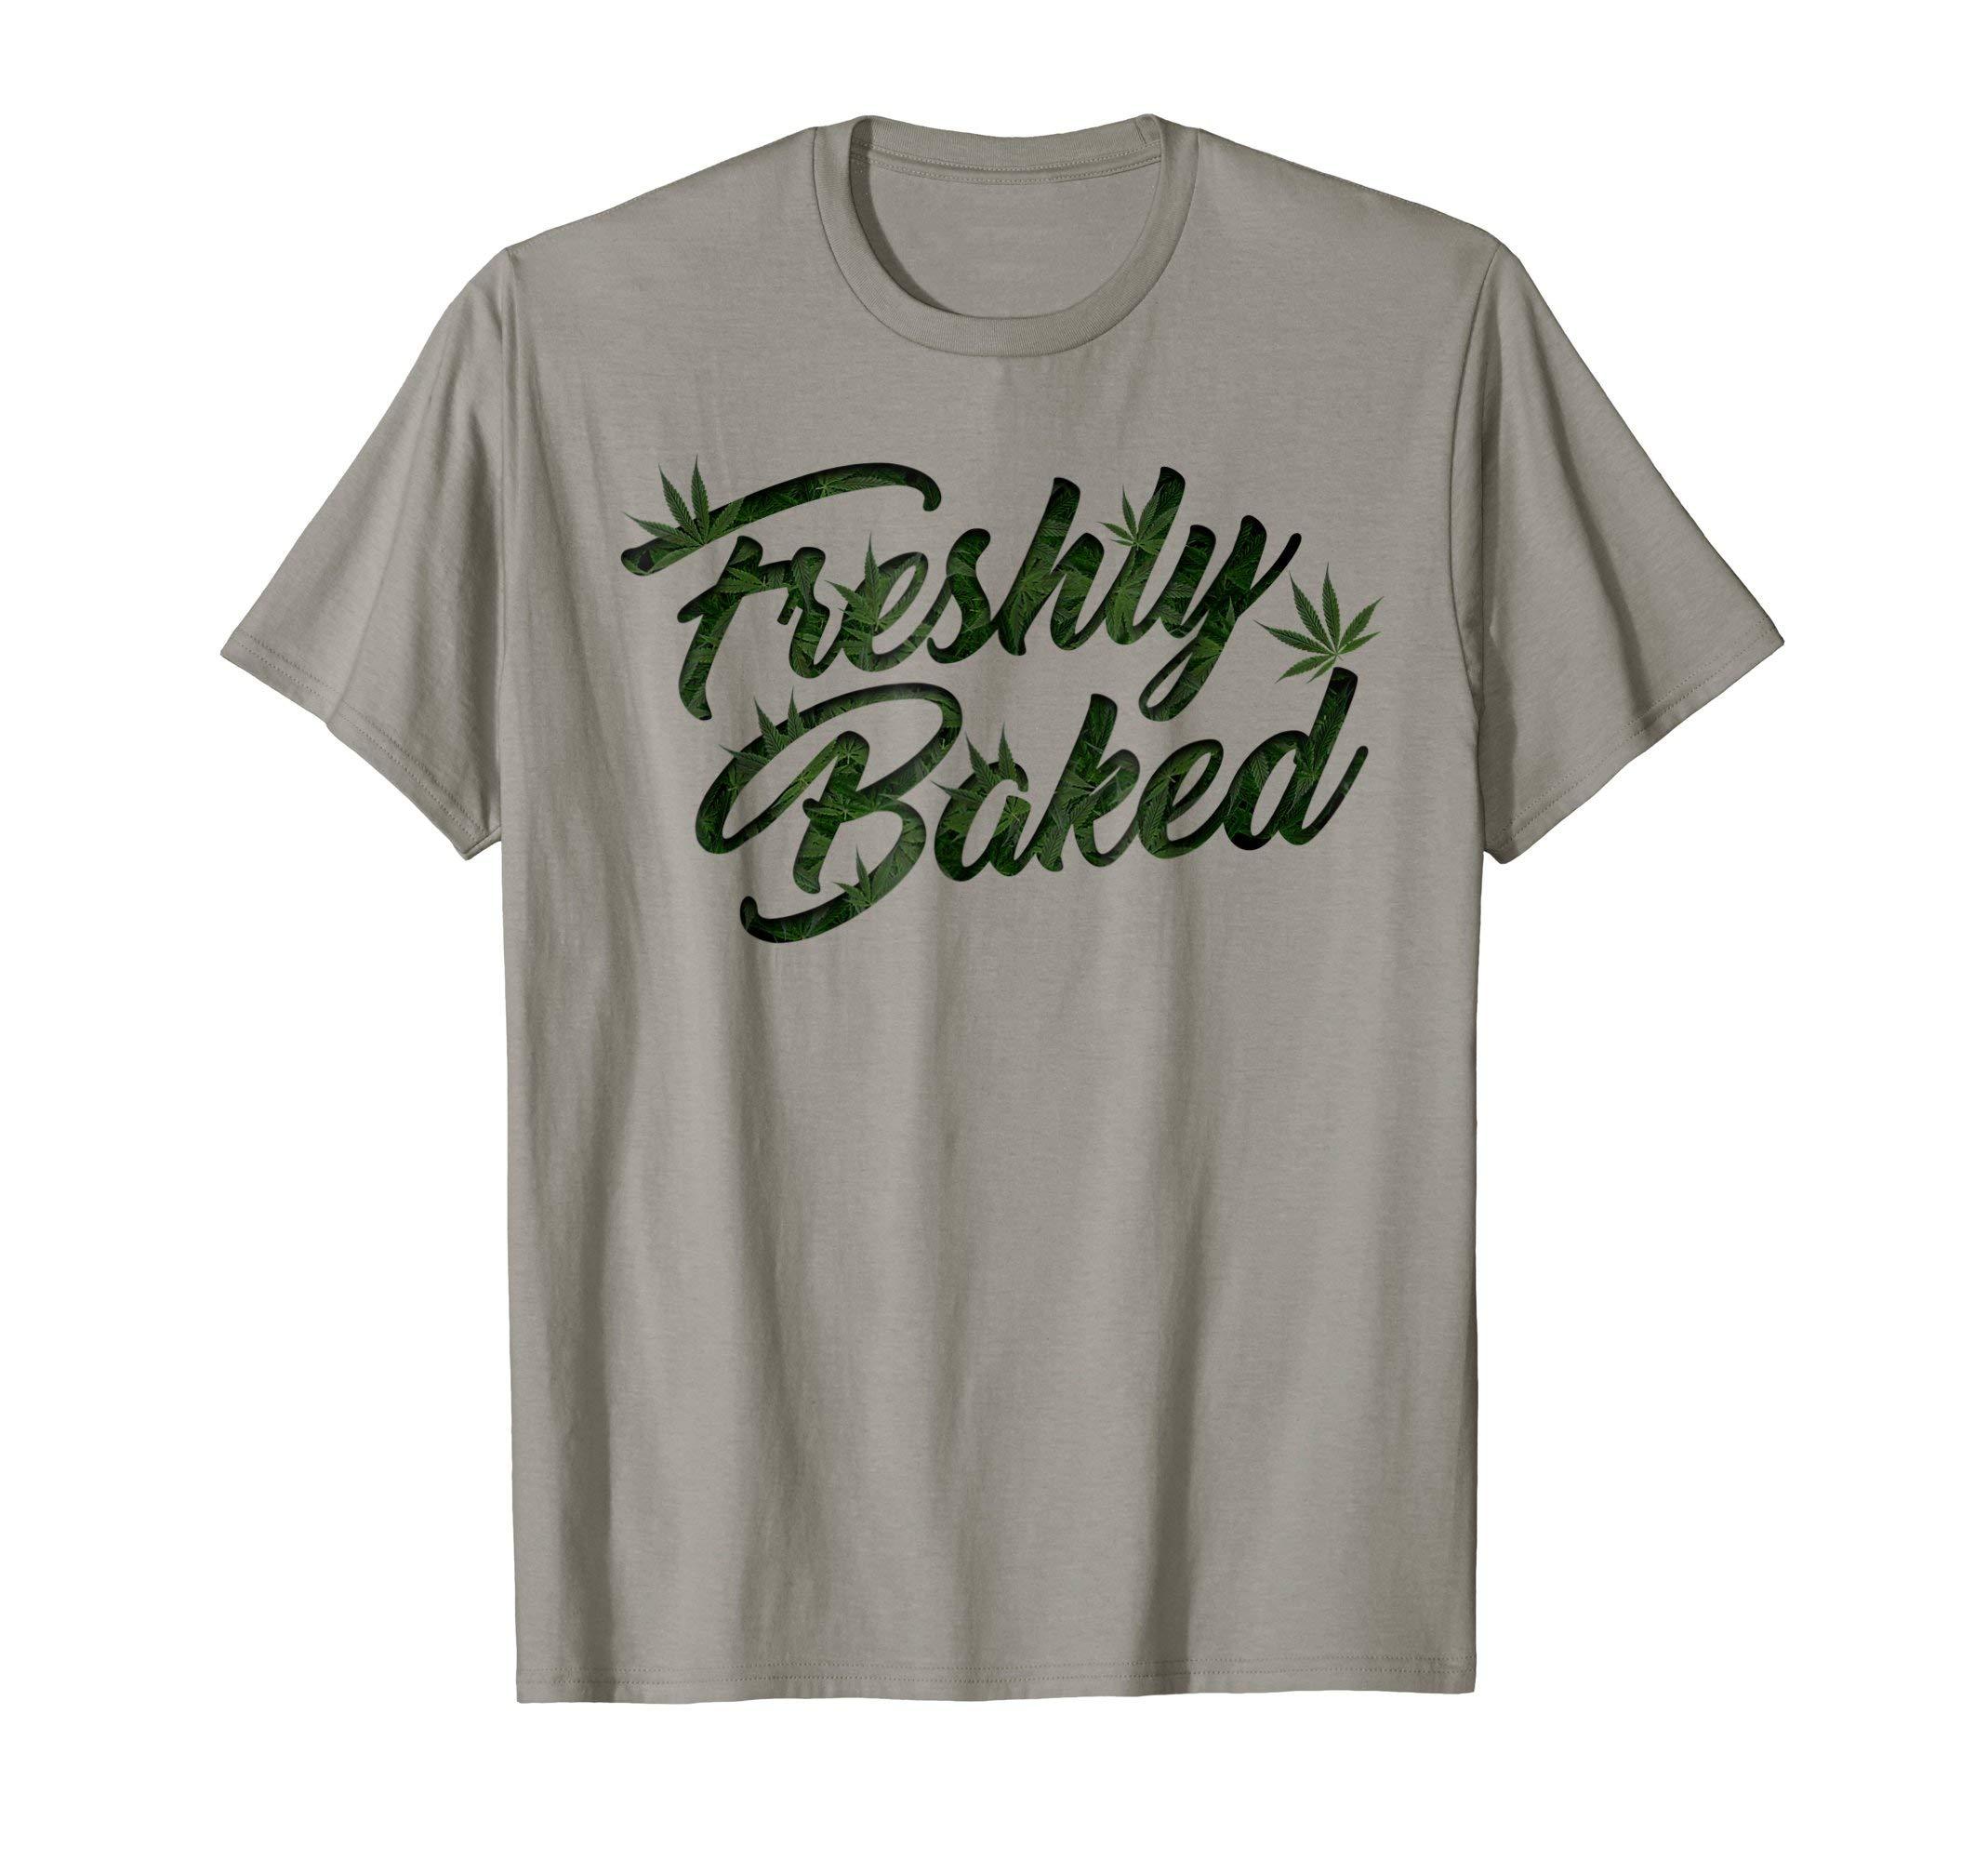 THC Freshly Baked Cannabis Medical Marijuana T-Shirt